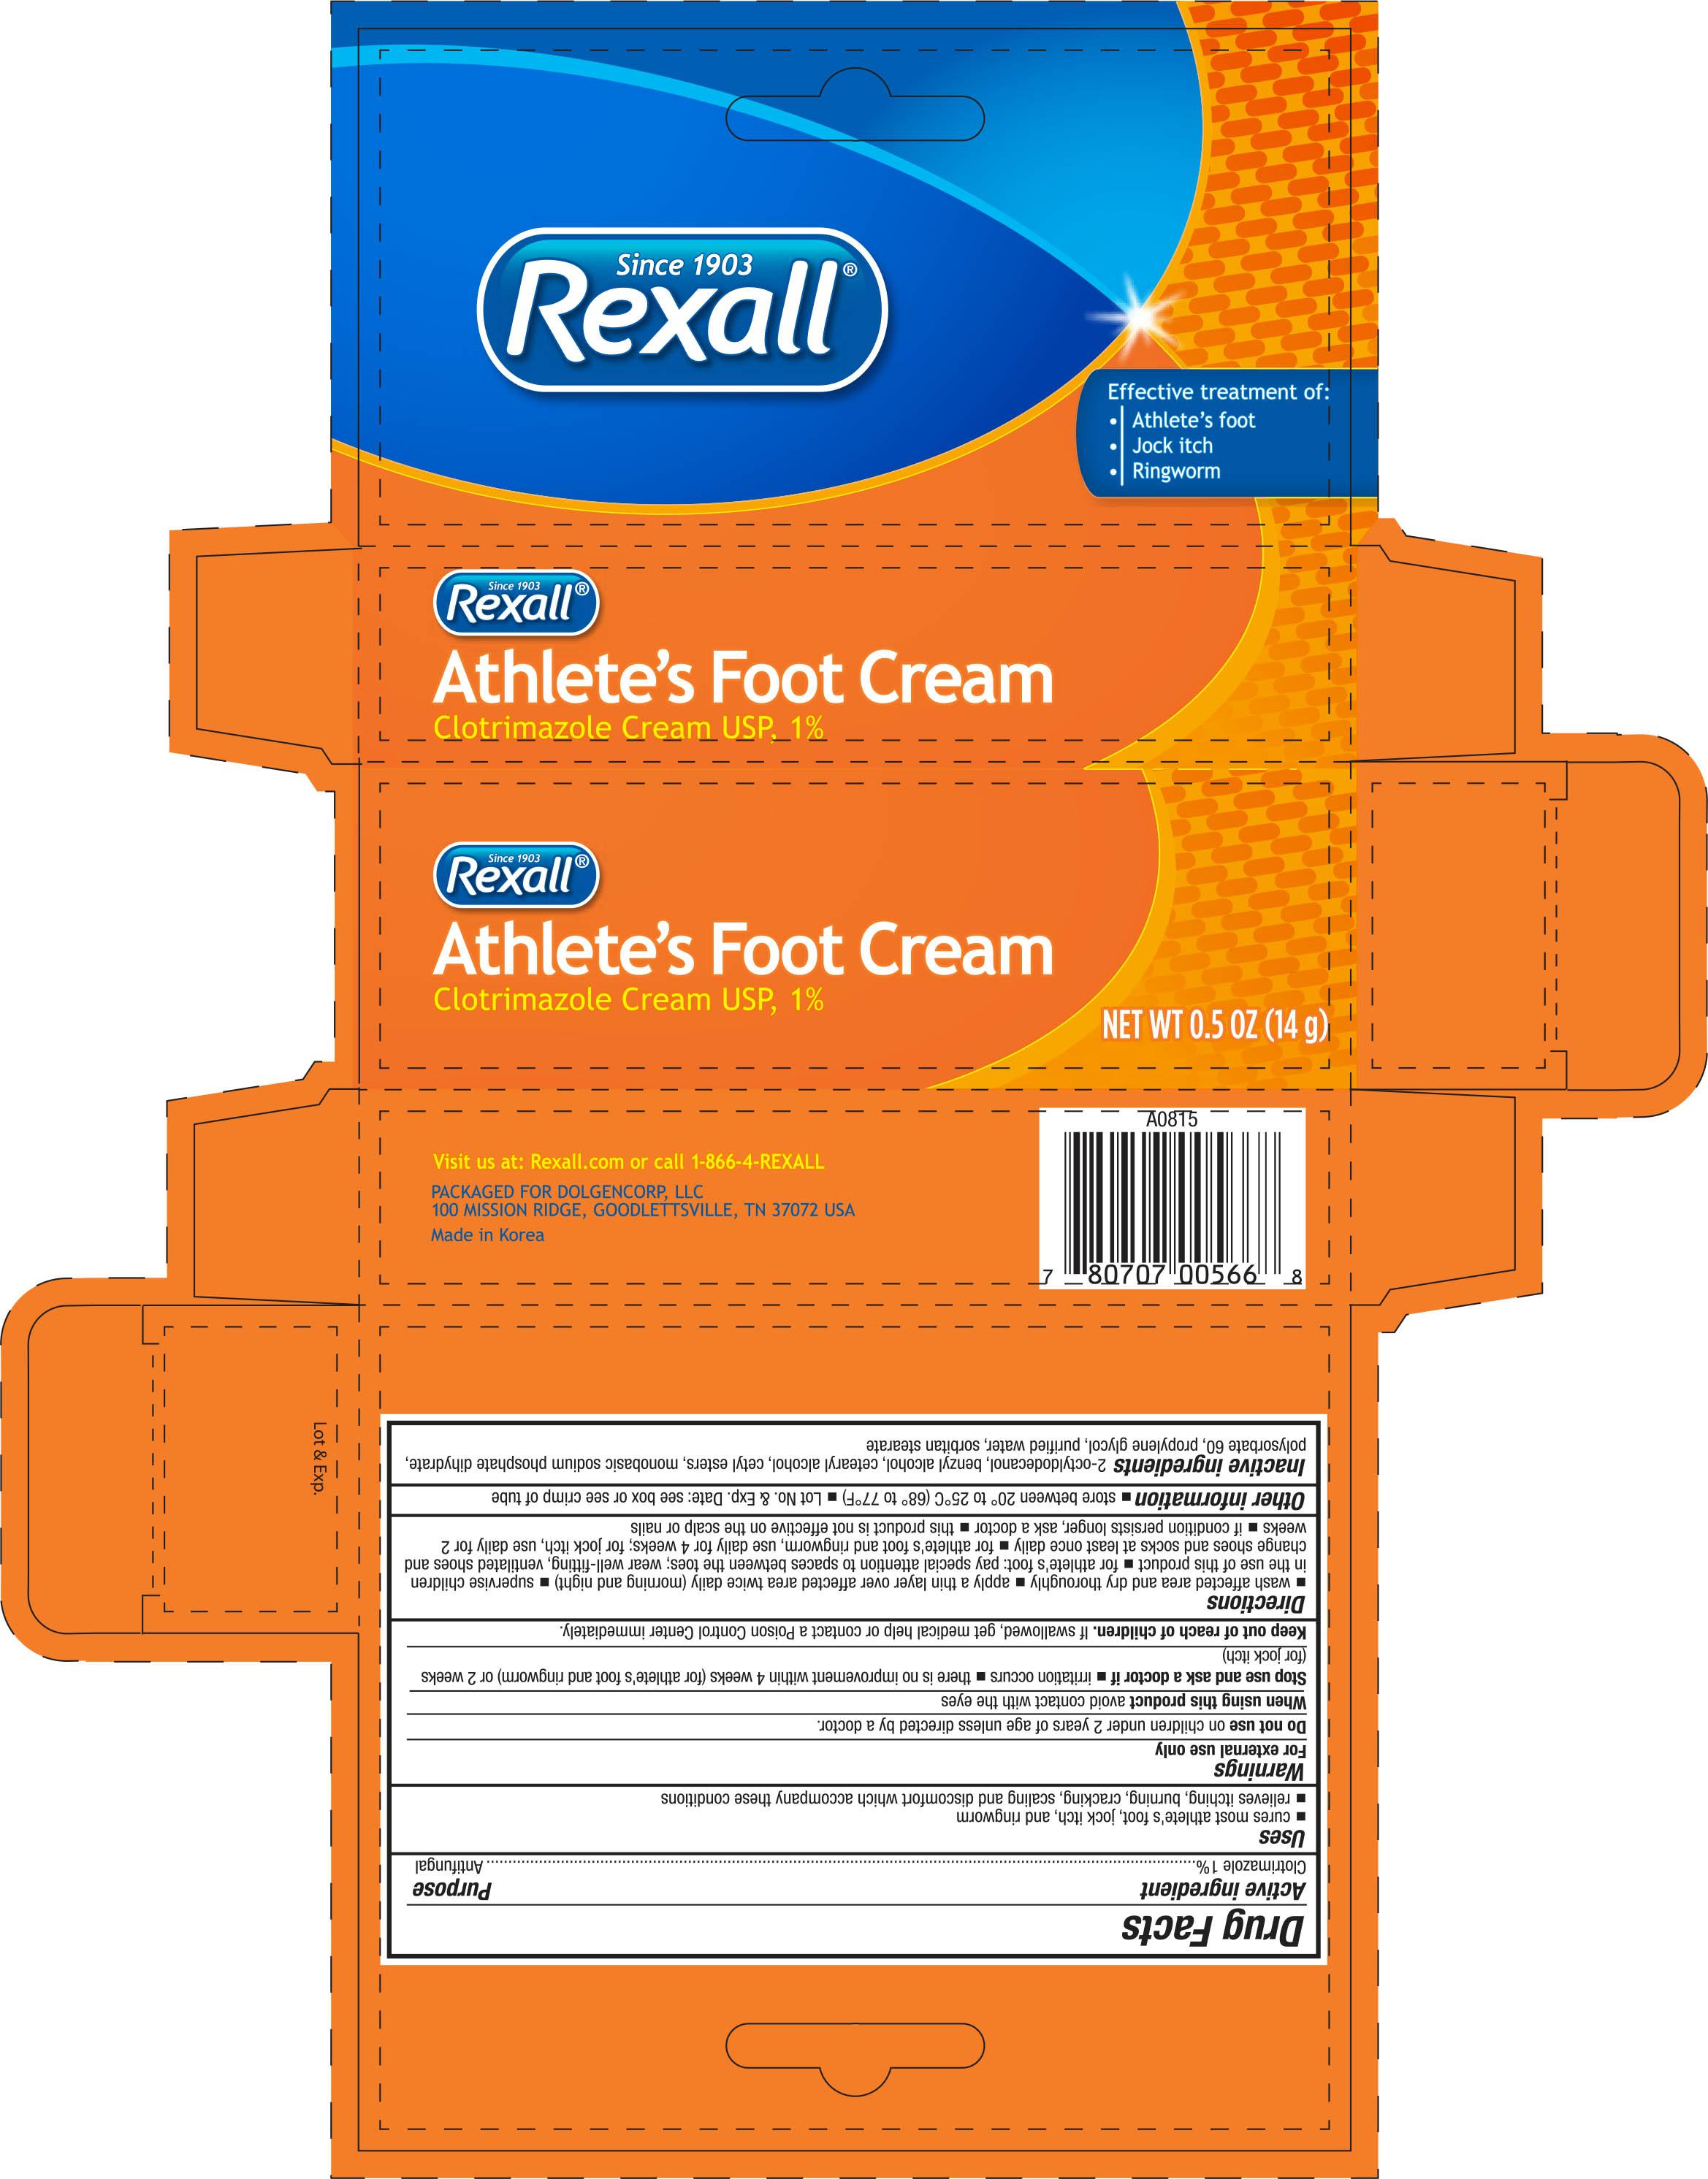 Rexall Athletes Foot (Clotrimazole) Cream [Dolgencorp Llc]